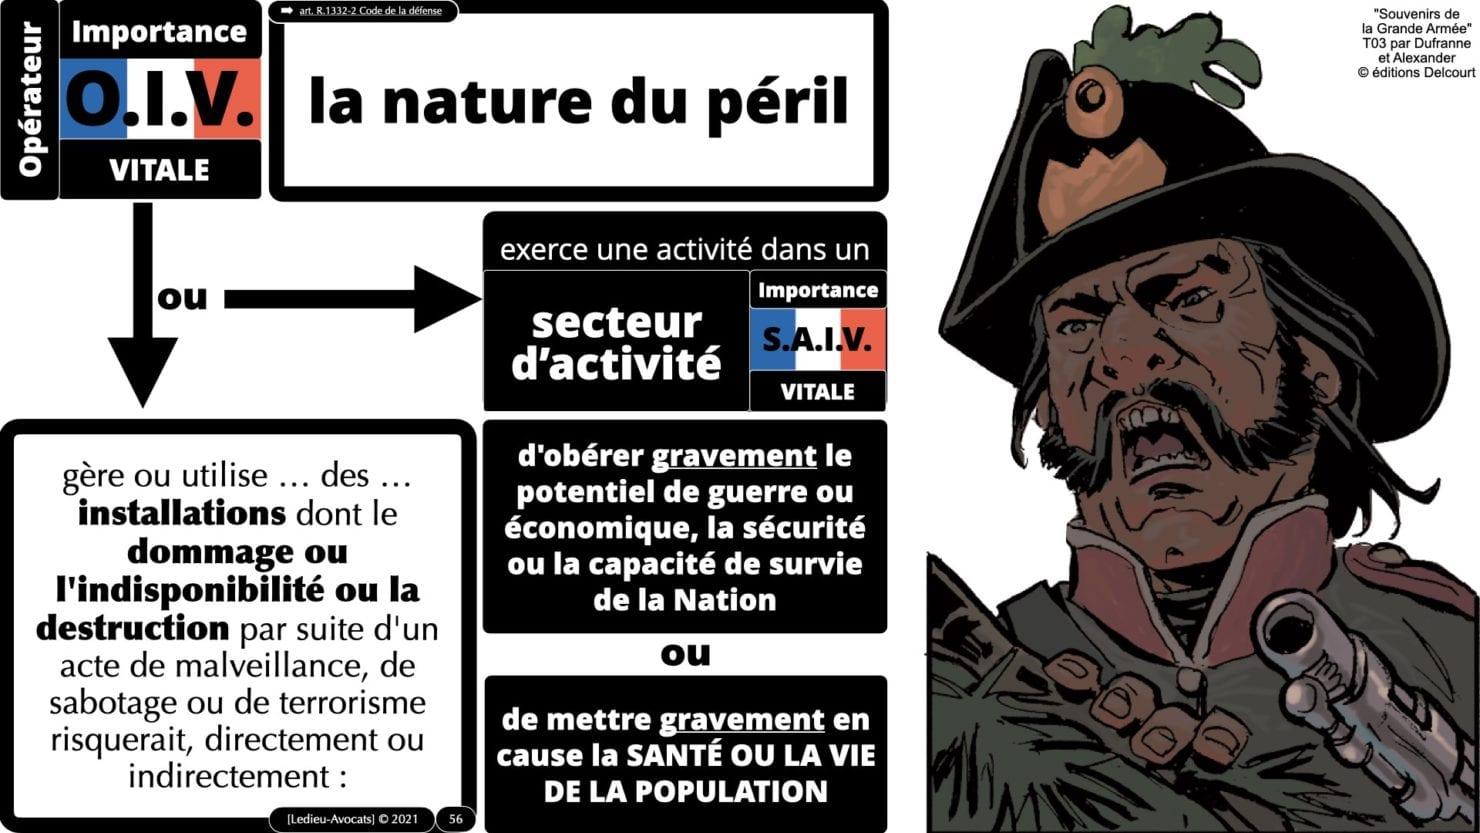 337 cyber sécurité #1 OIV OSE Critical Entities © Ledieu-avocat 15-06-2021.056